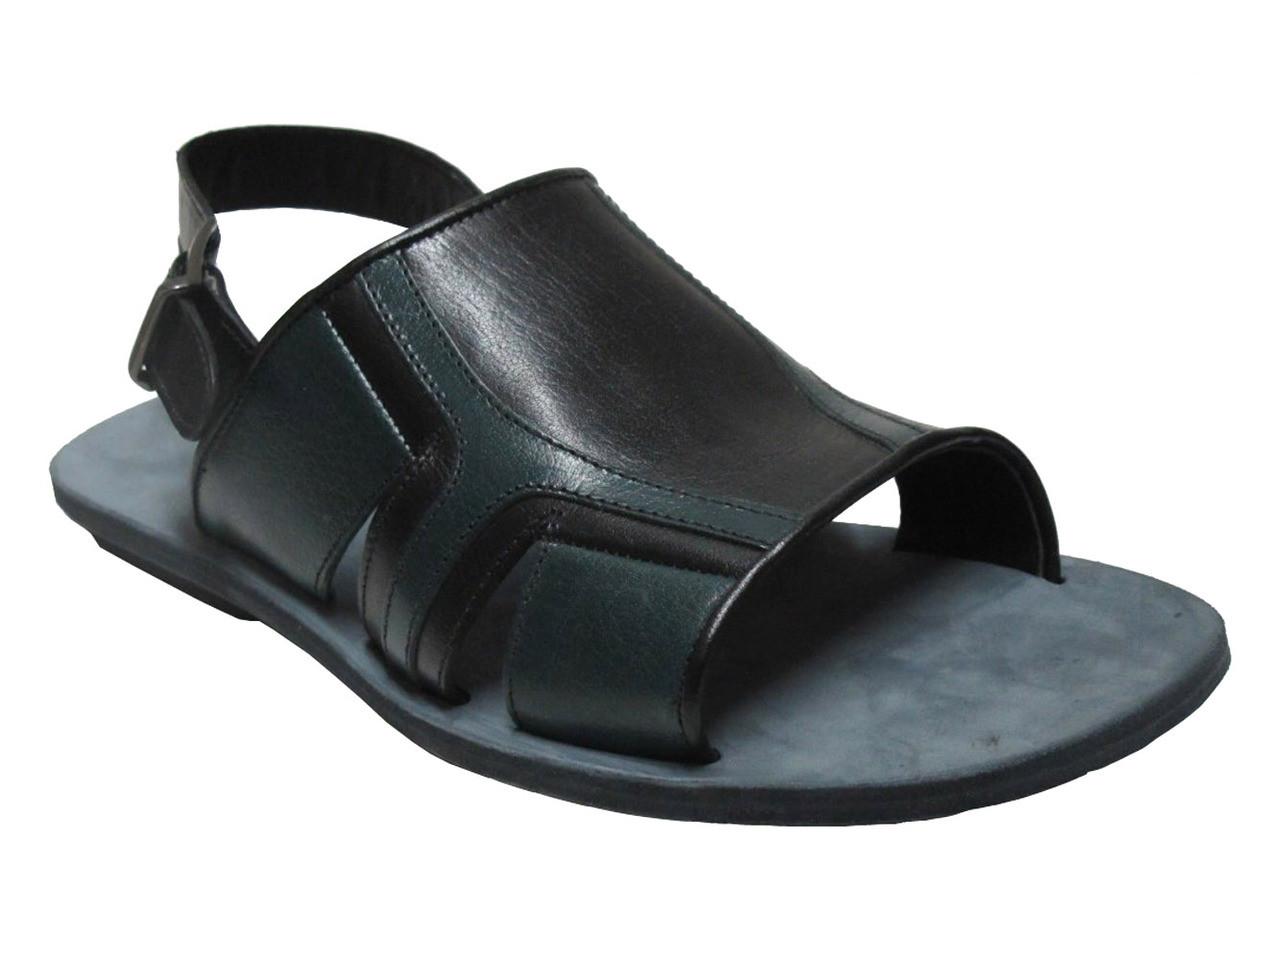 Davinci Italian Dressy Leather Sandals